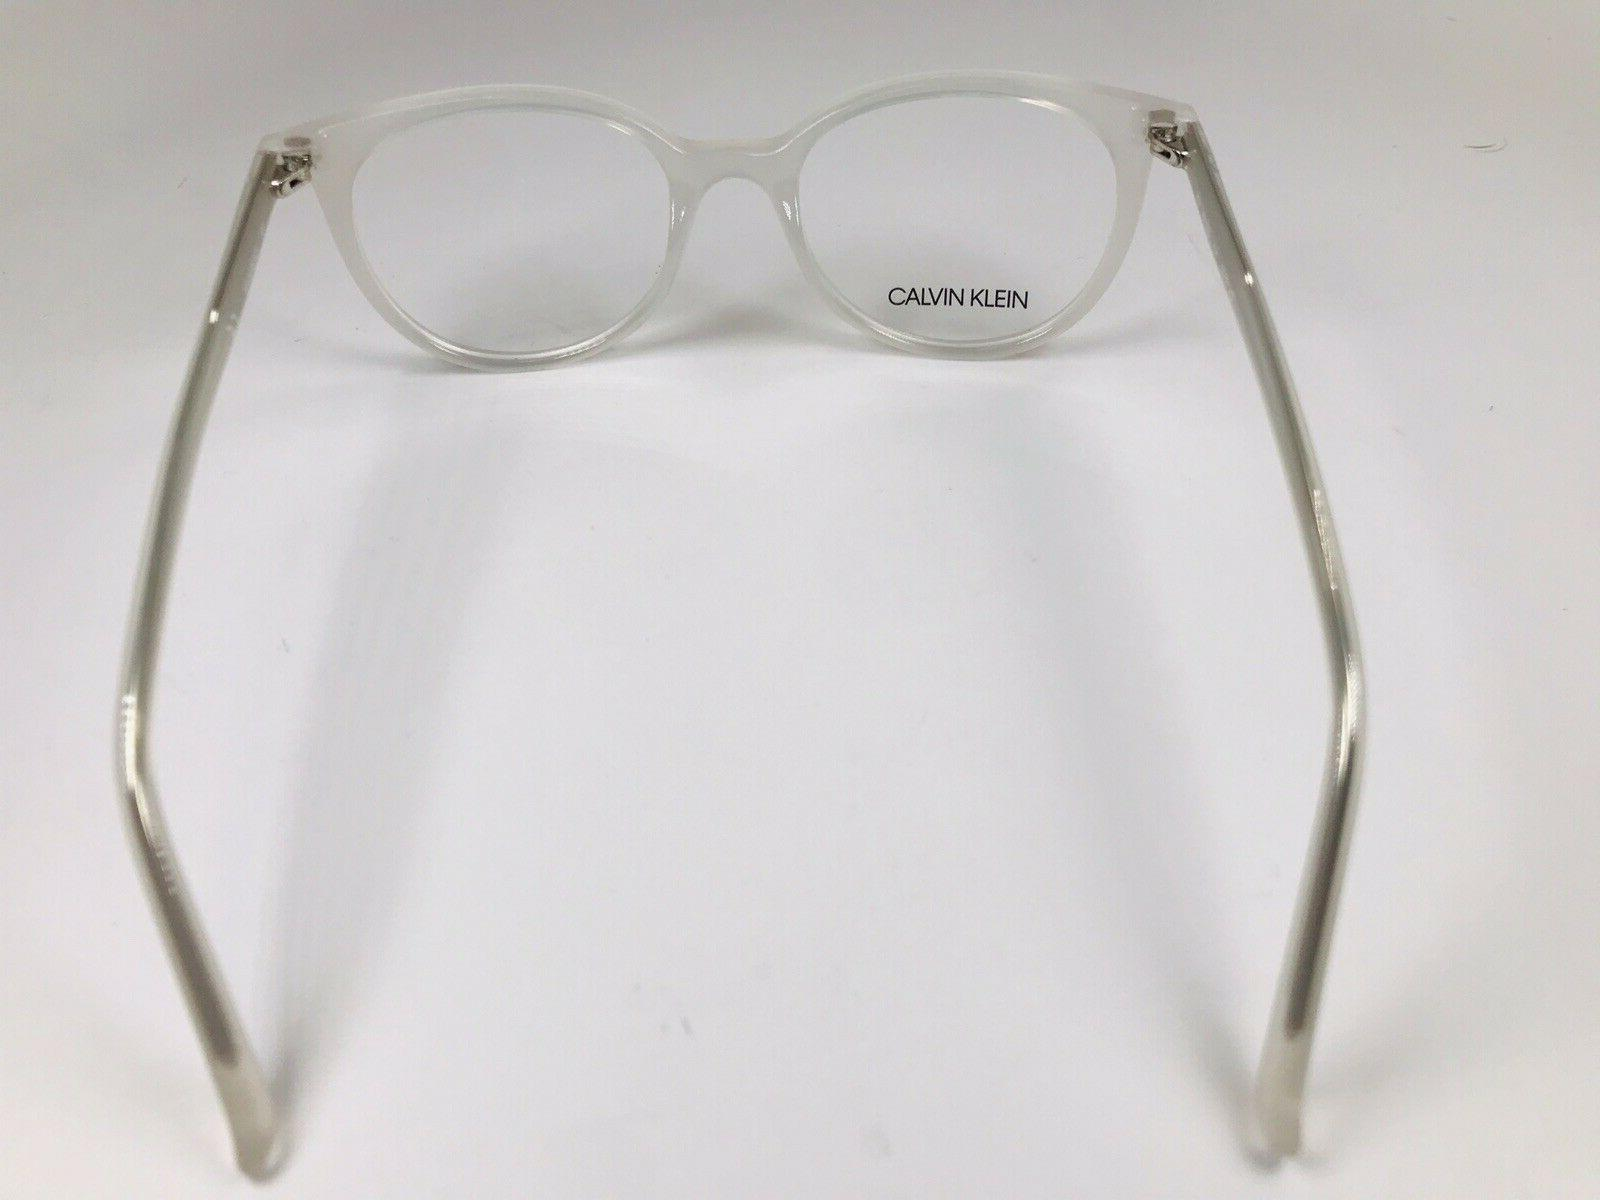 New Calvin Klein CK19508 101 Eyeglasses 49mm with